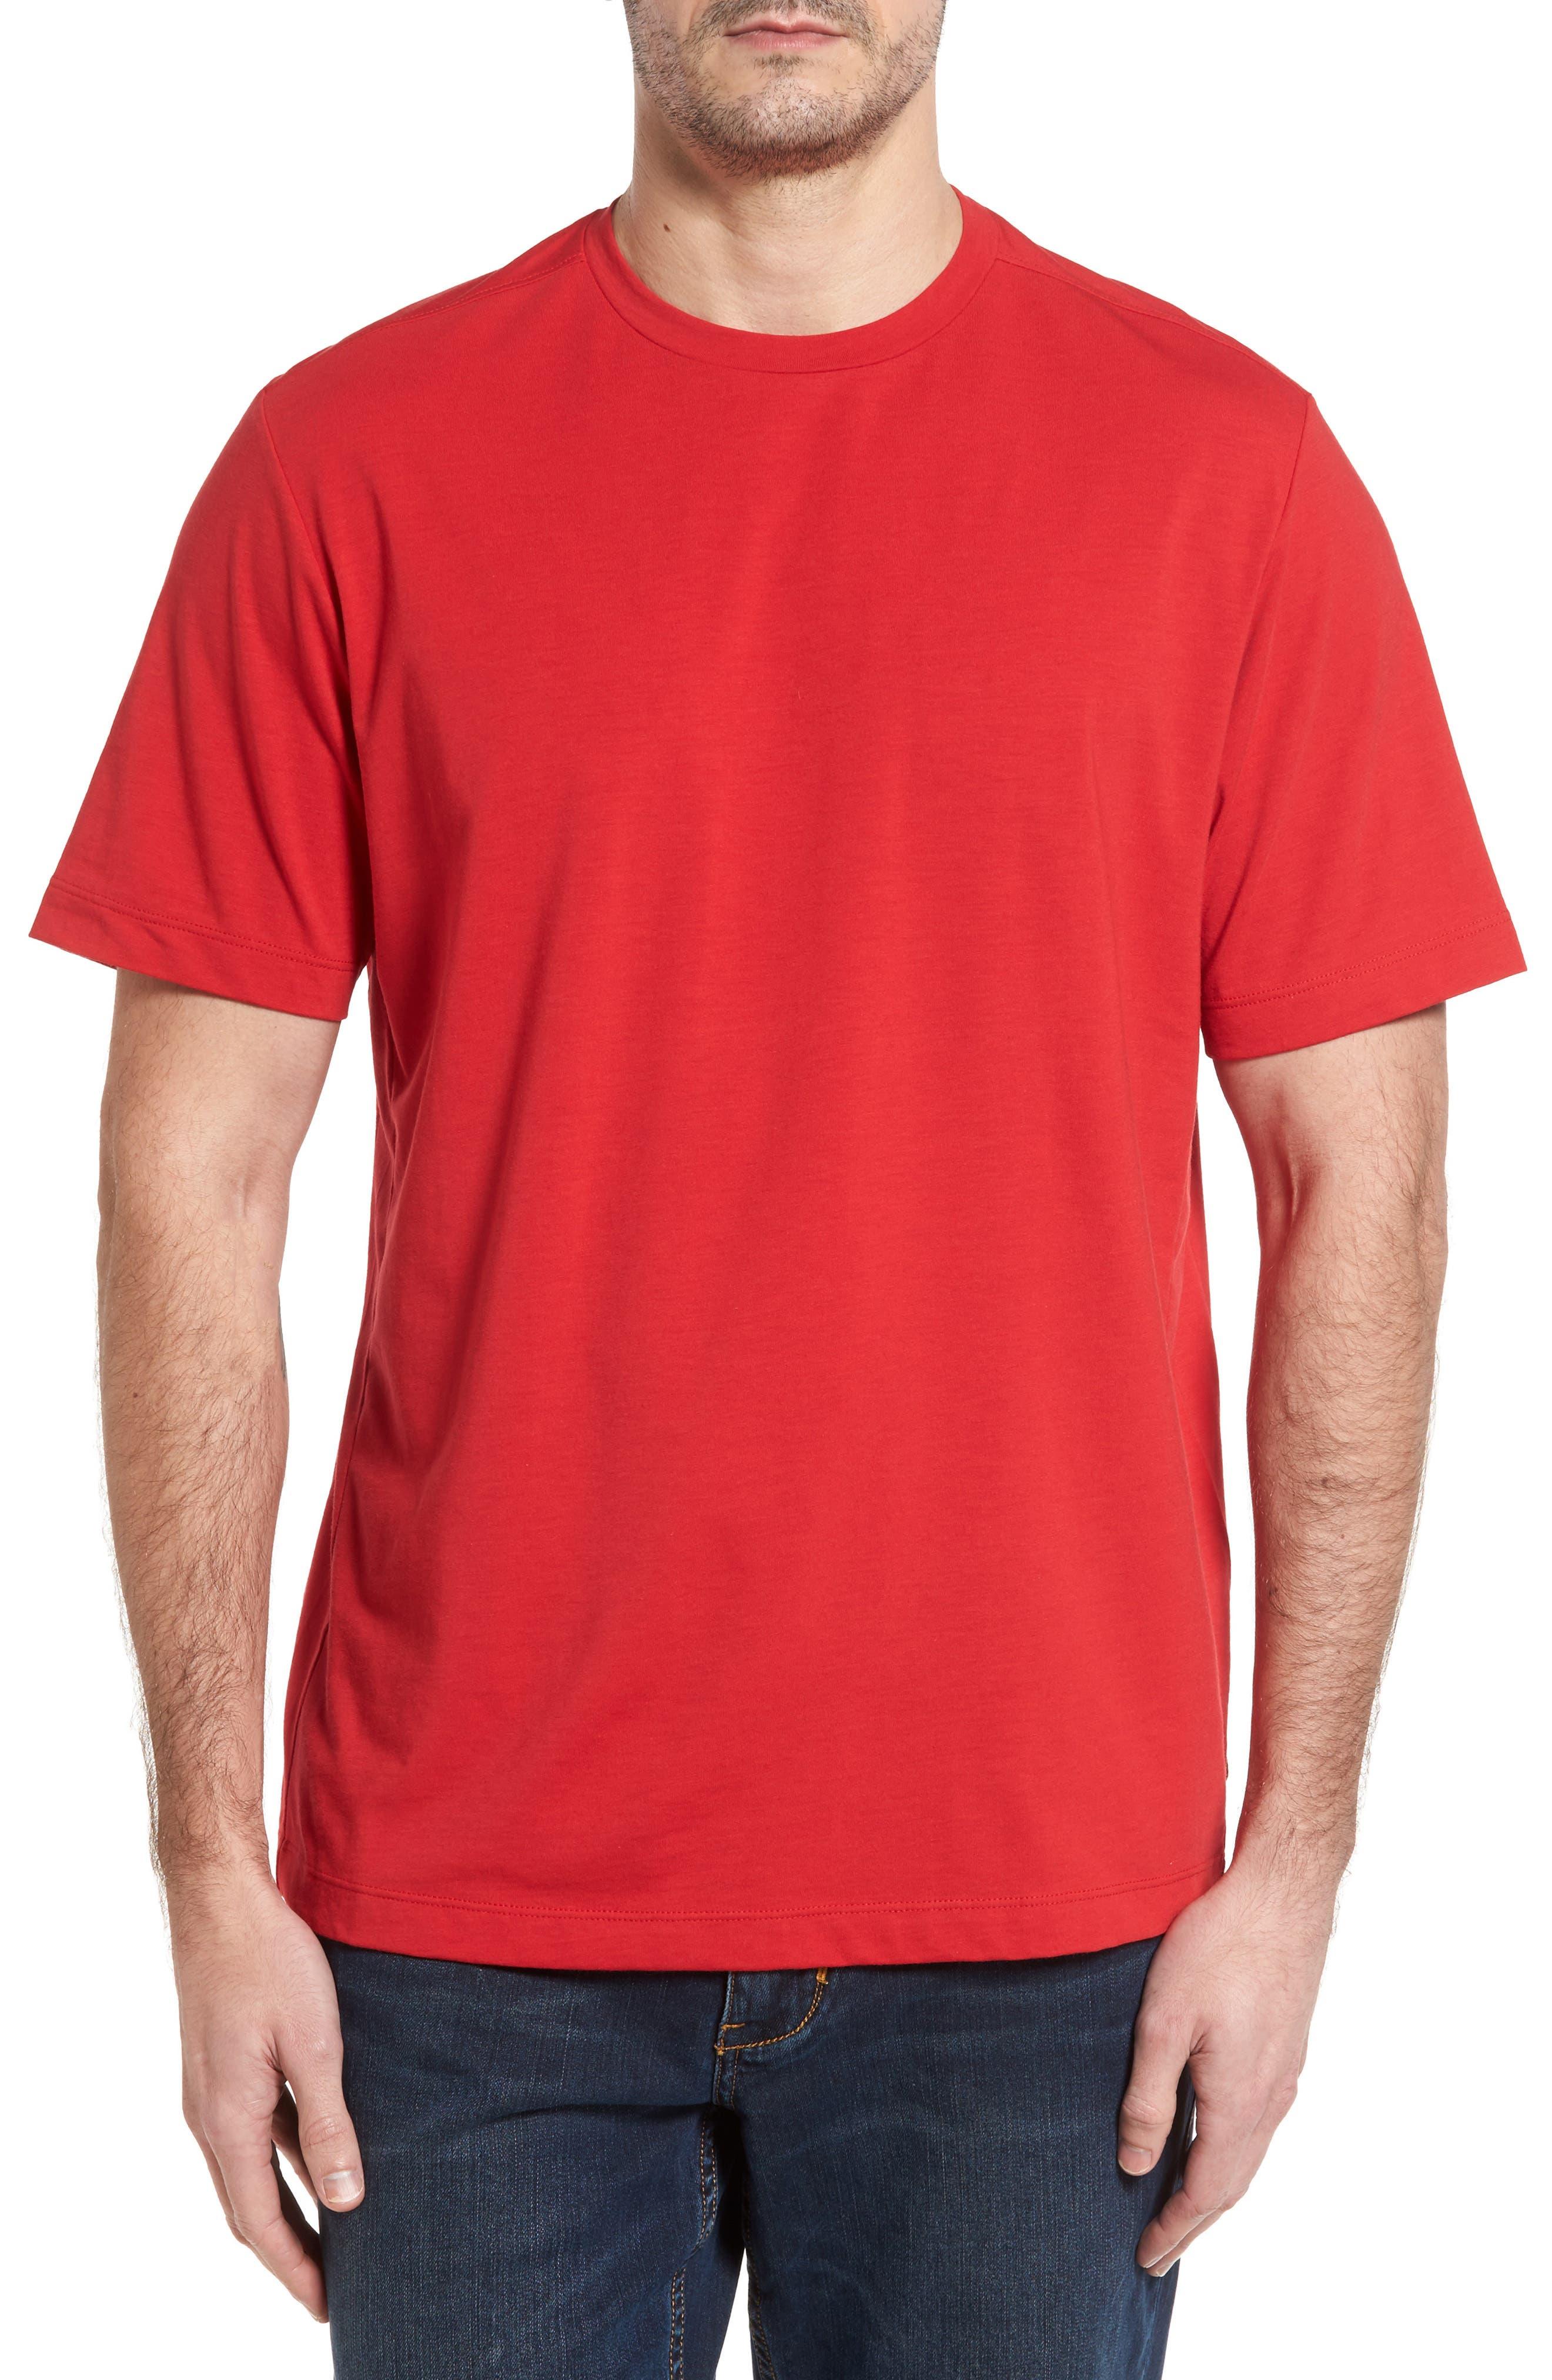 Tropicool T-Shirt,                             Main thumbnail 11, color,